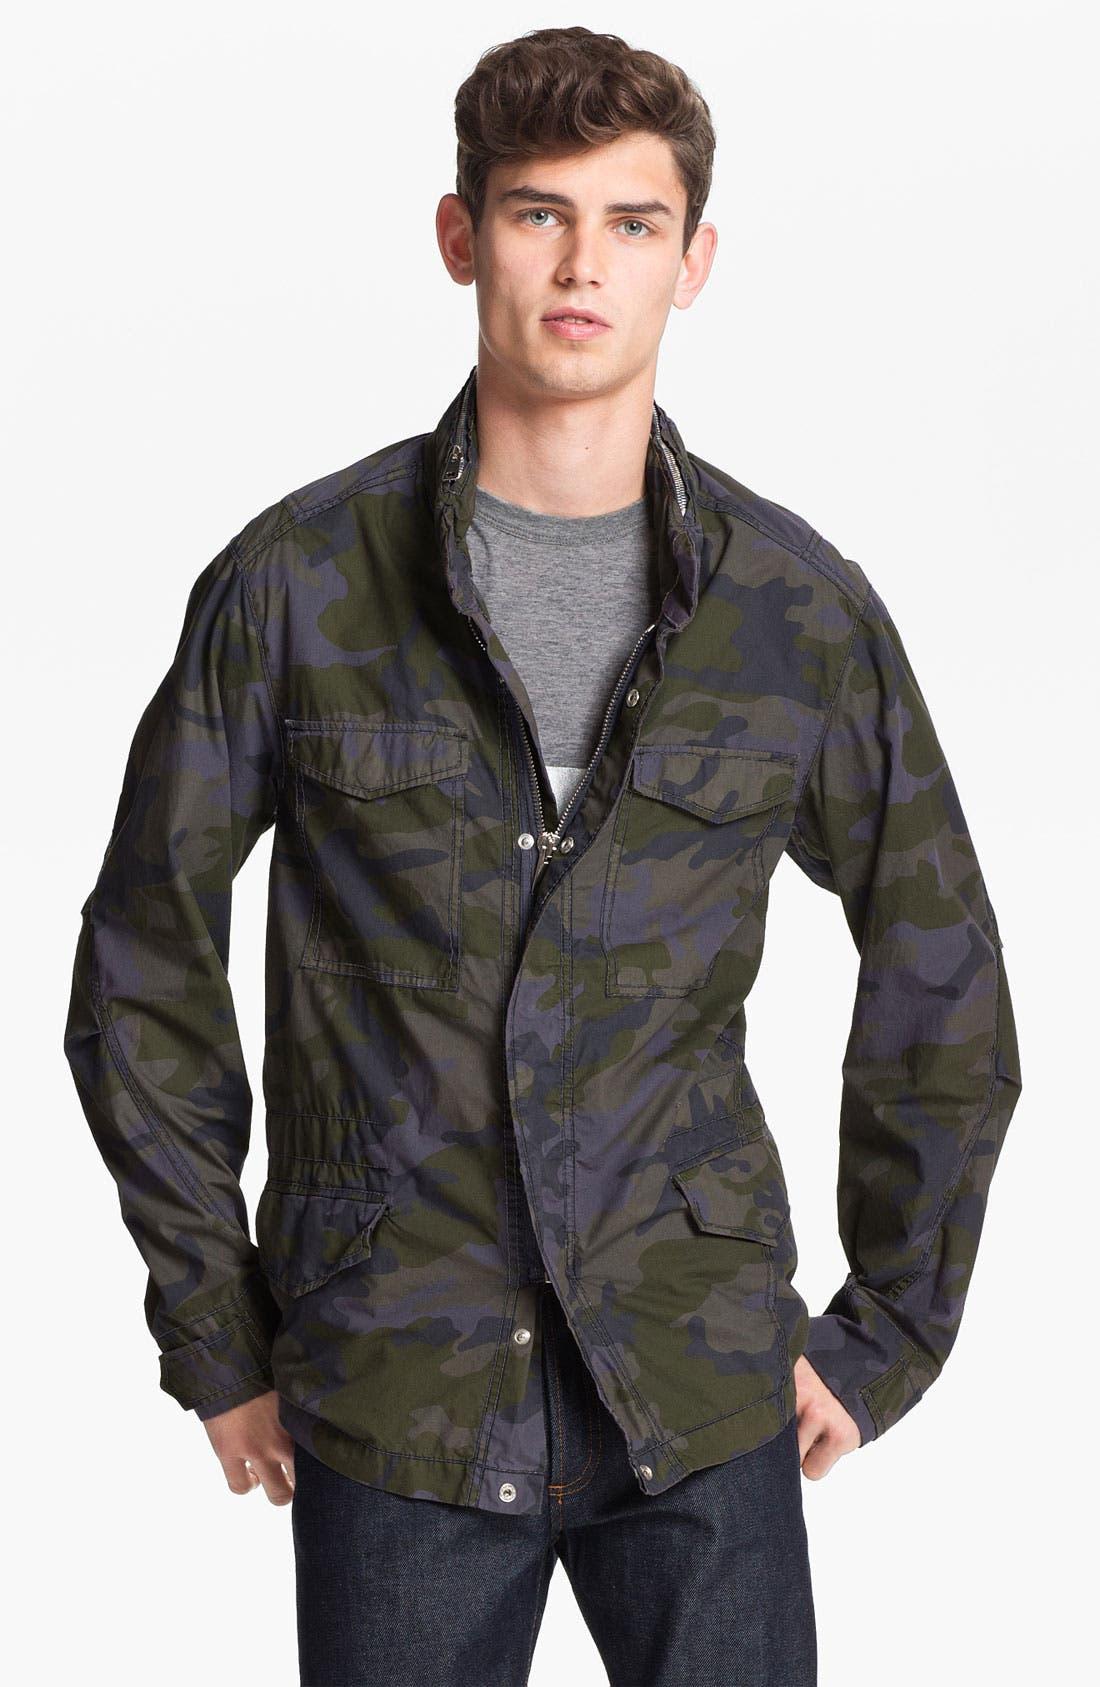 Alternate Image 1 Selected - U Clothing 'Zane' M-65 Field Jacket